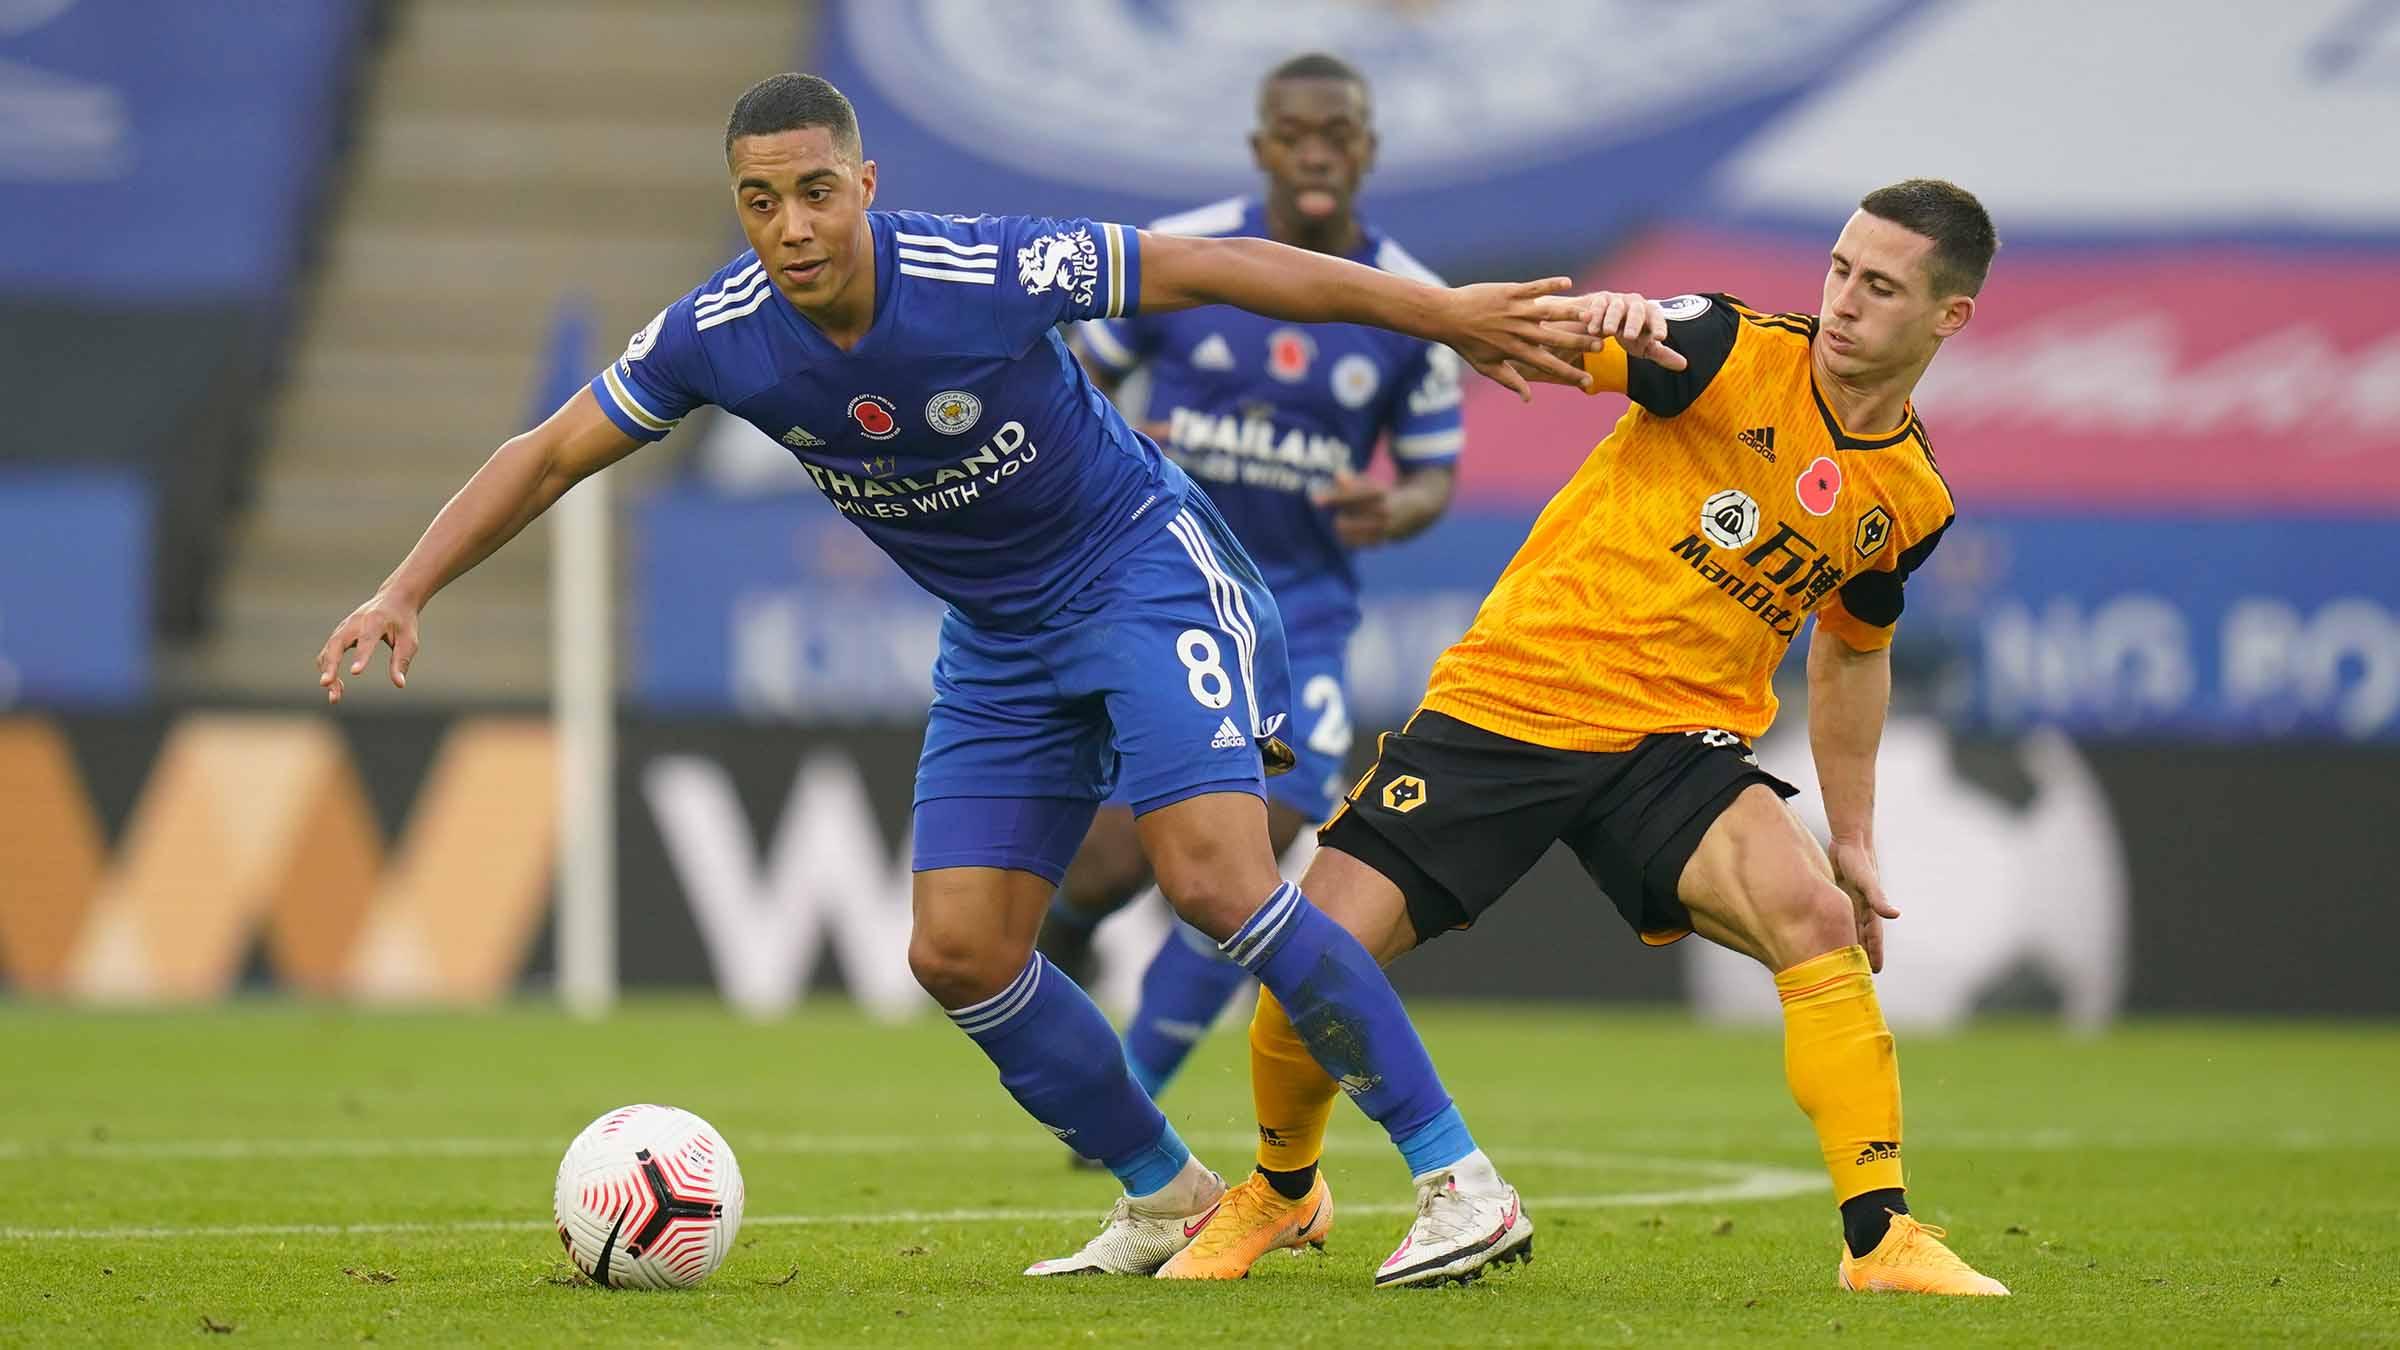 Link xem trực tiếp Leicester vs Wolves 21h00 ngày 14/8